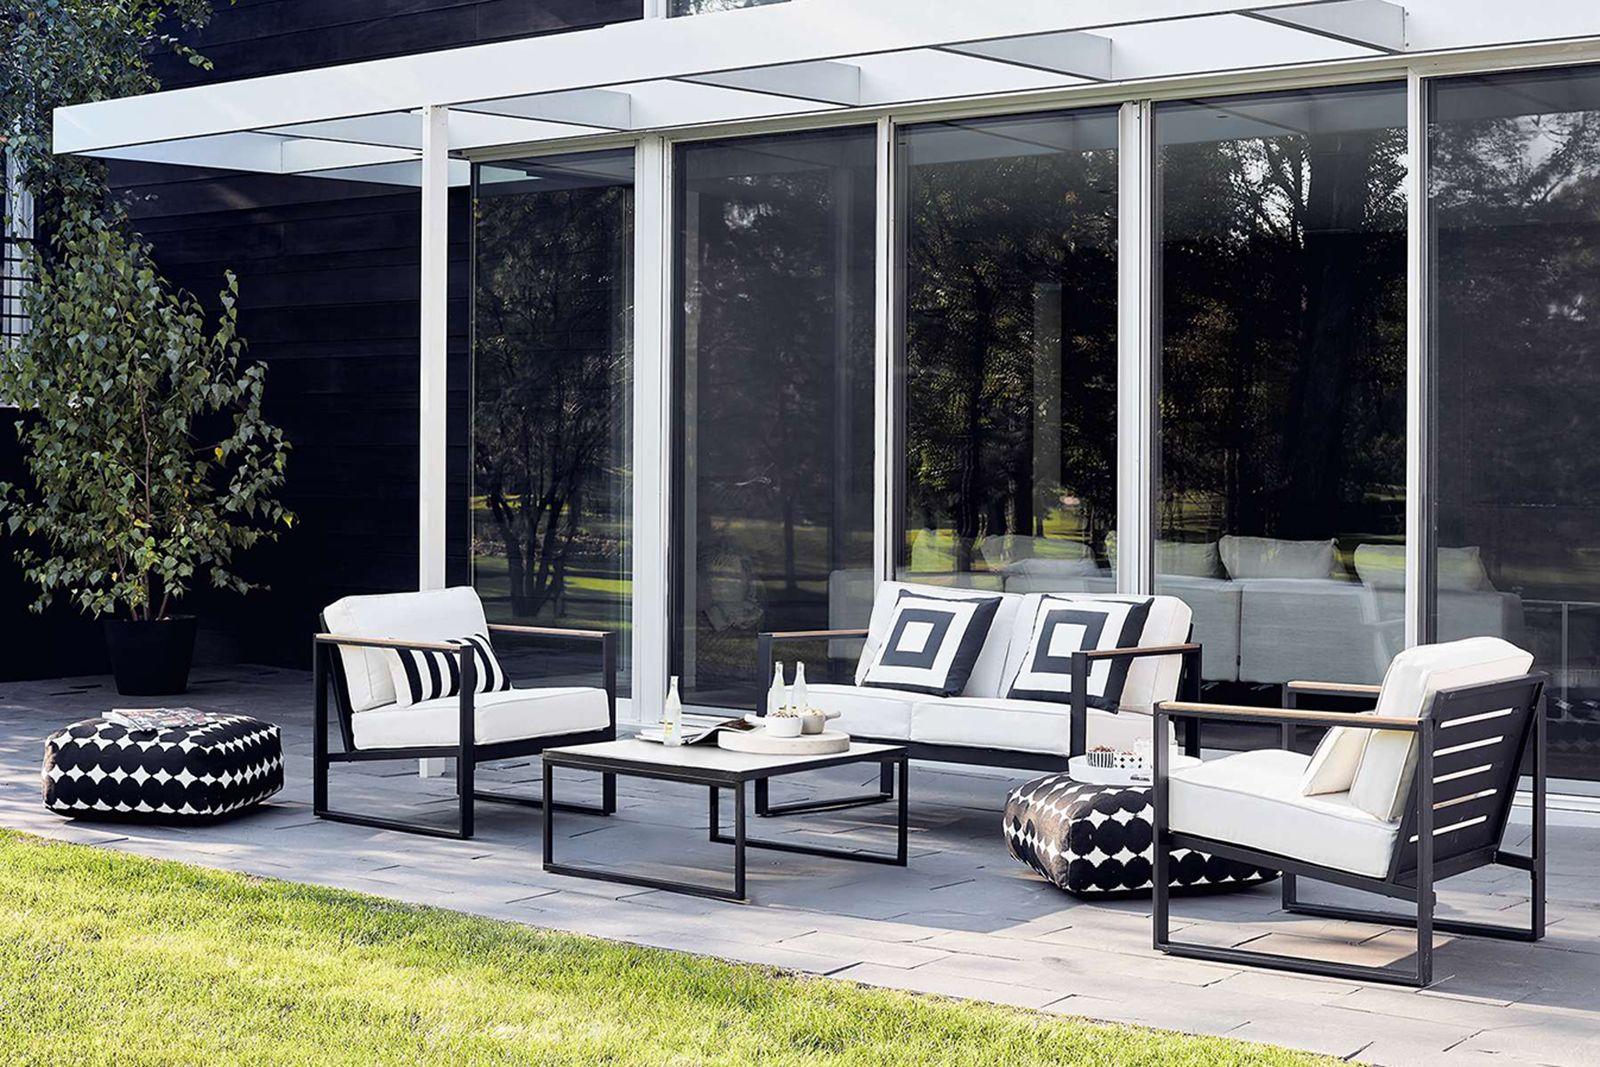 Fabulous Black + White Outdoor Finds at Target - 4-Piece Conversation Set